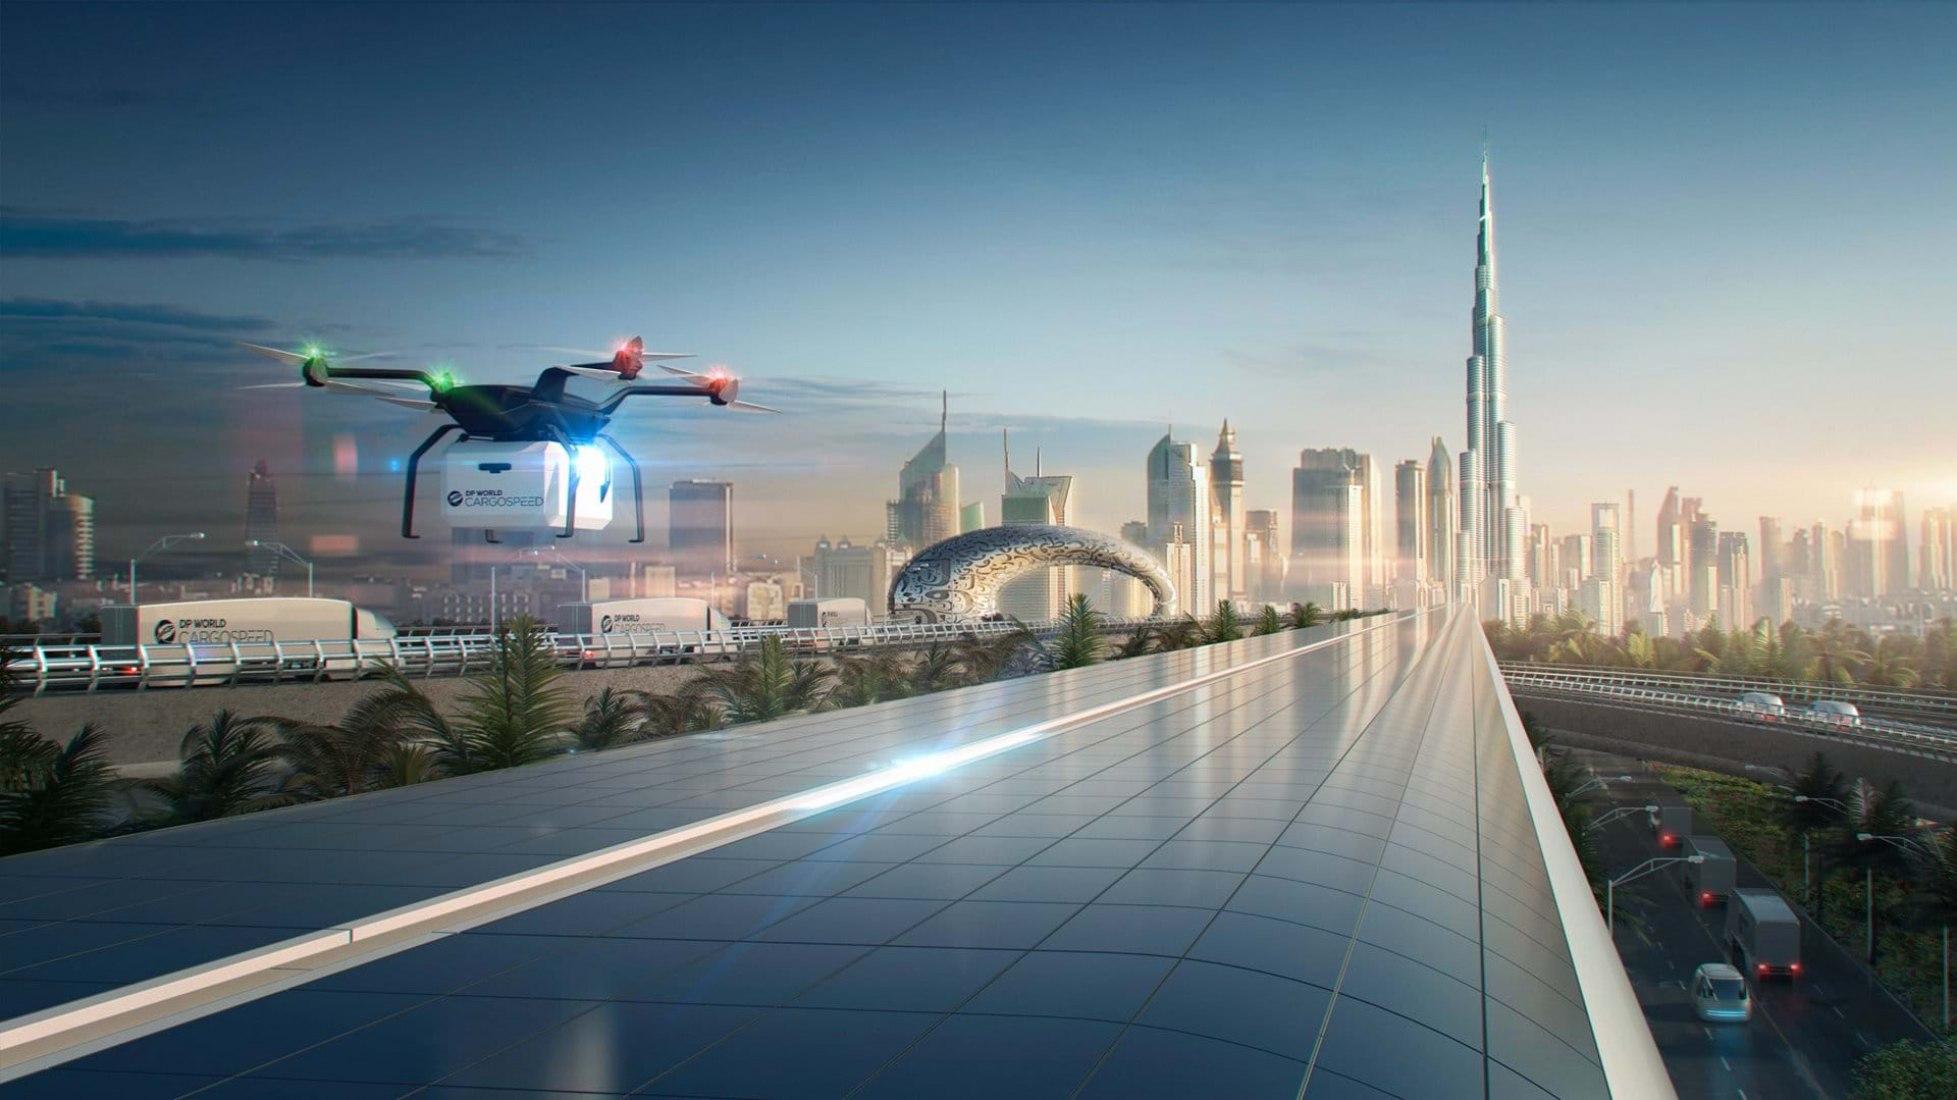 DP World Cargospeed in Dubai by Foster + Partners